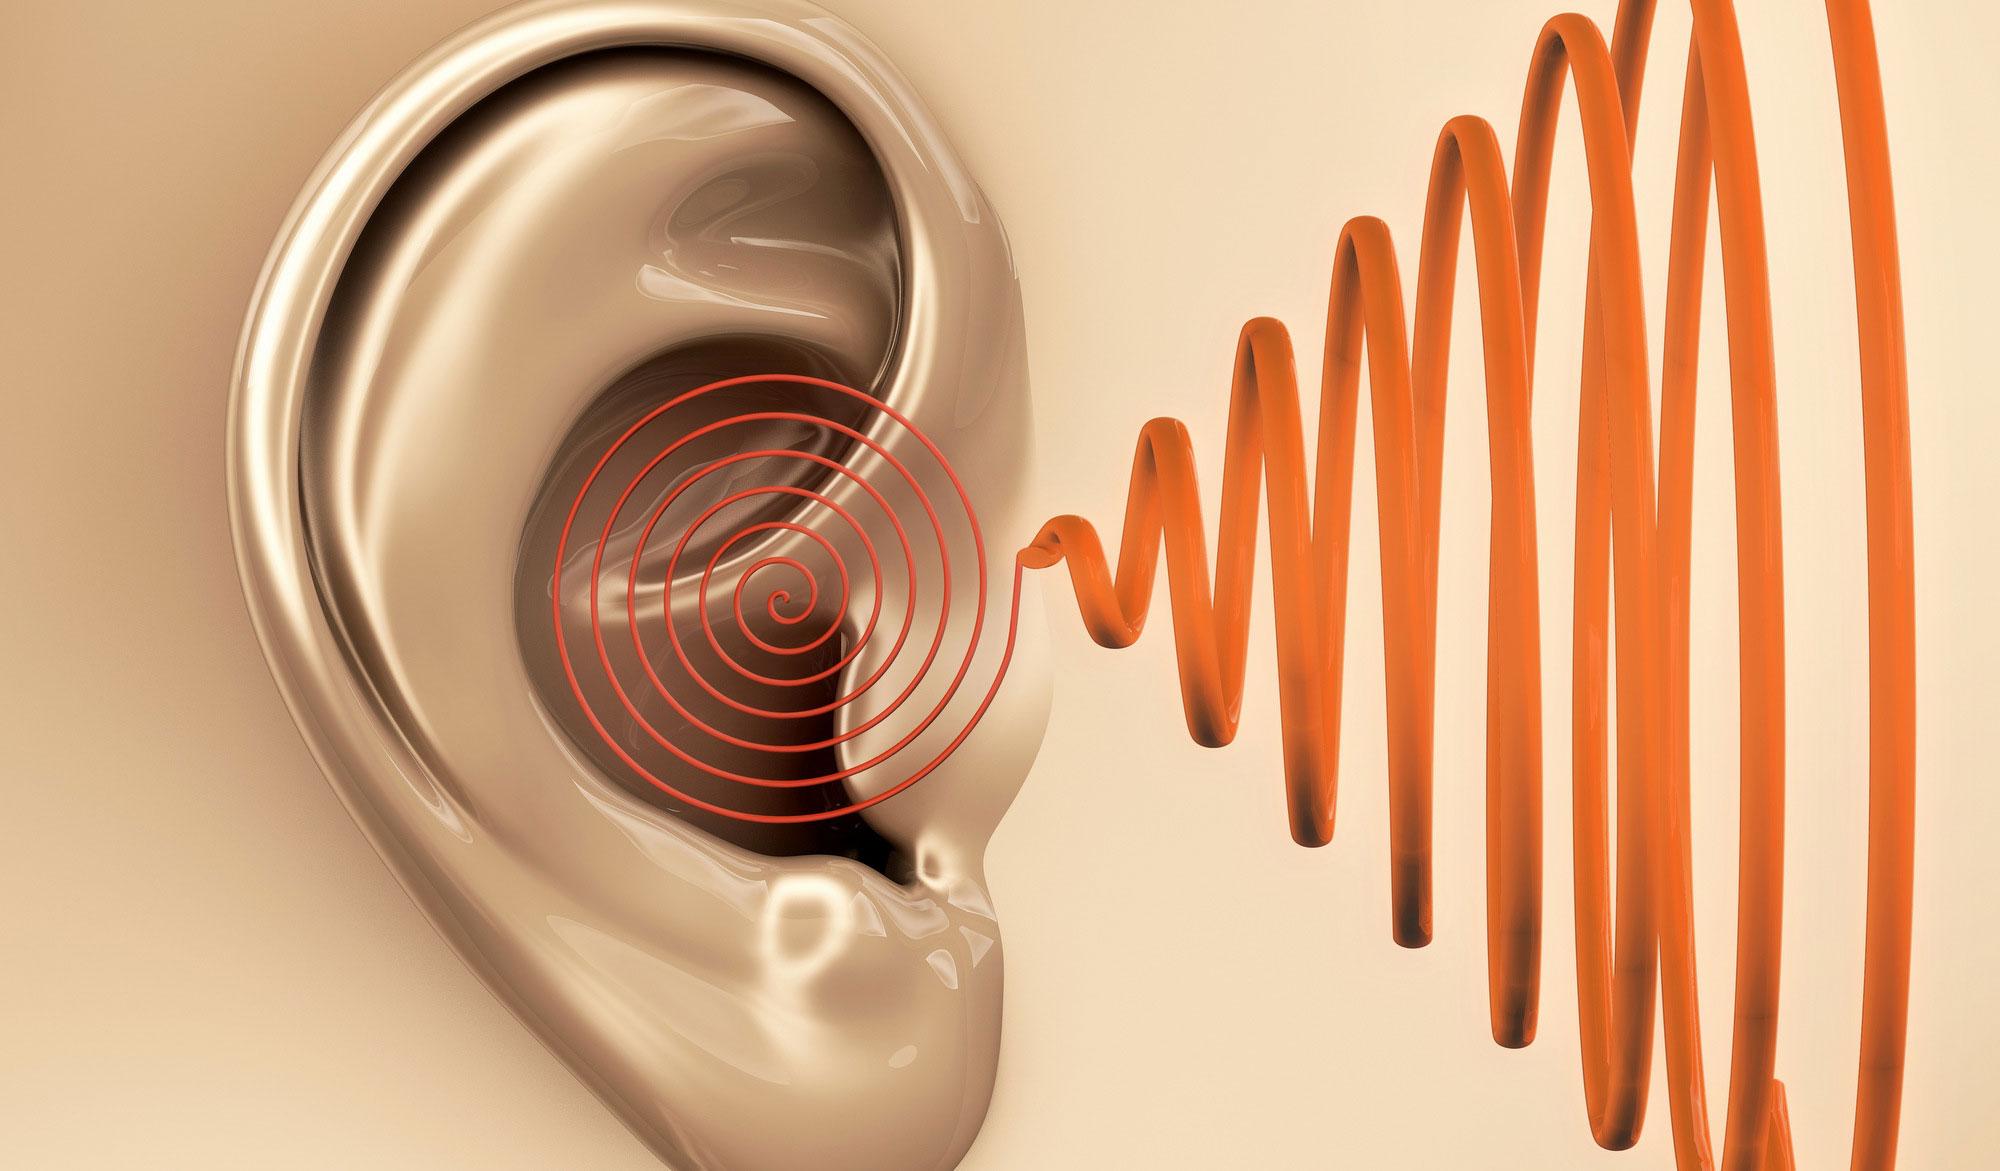 audiometria-vocal